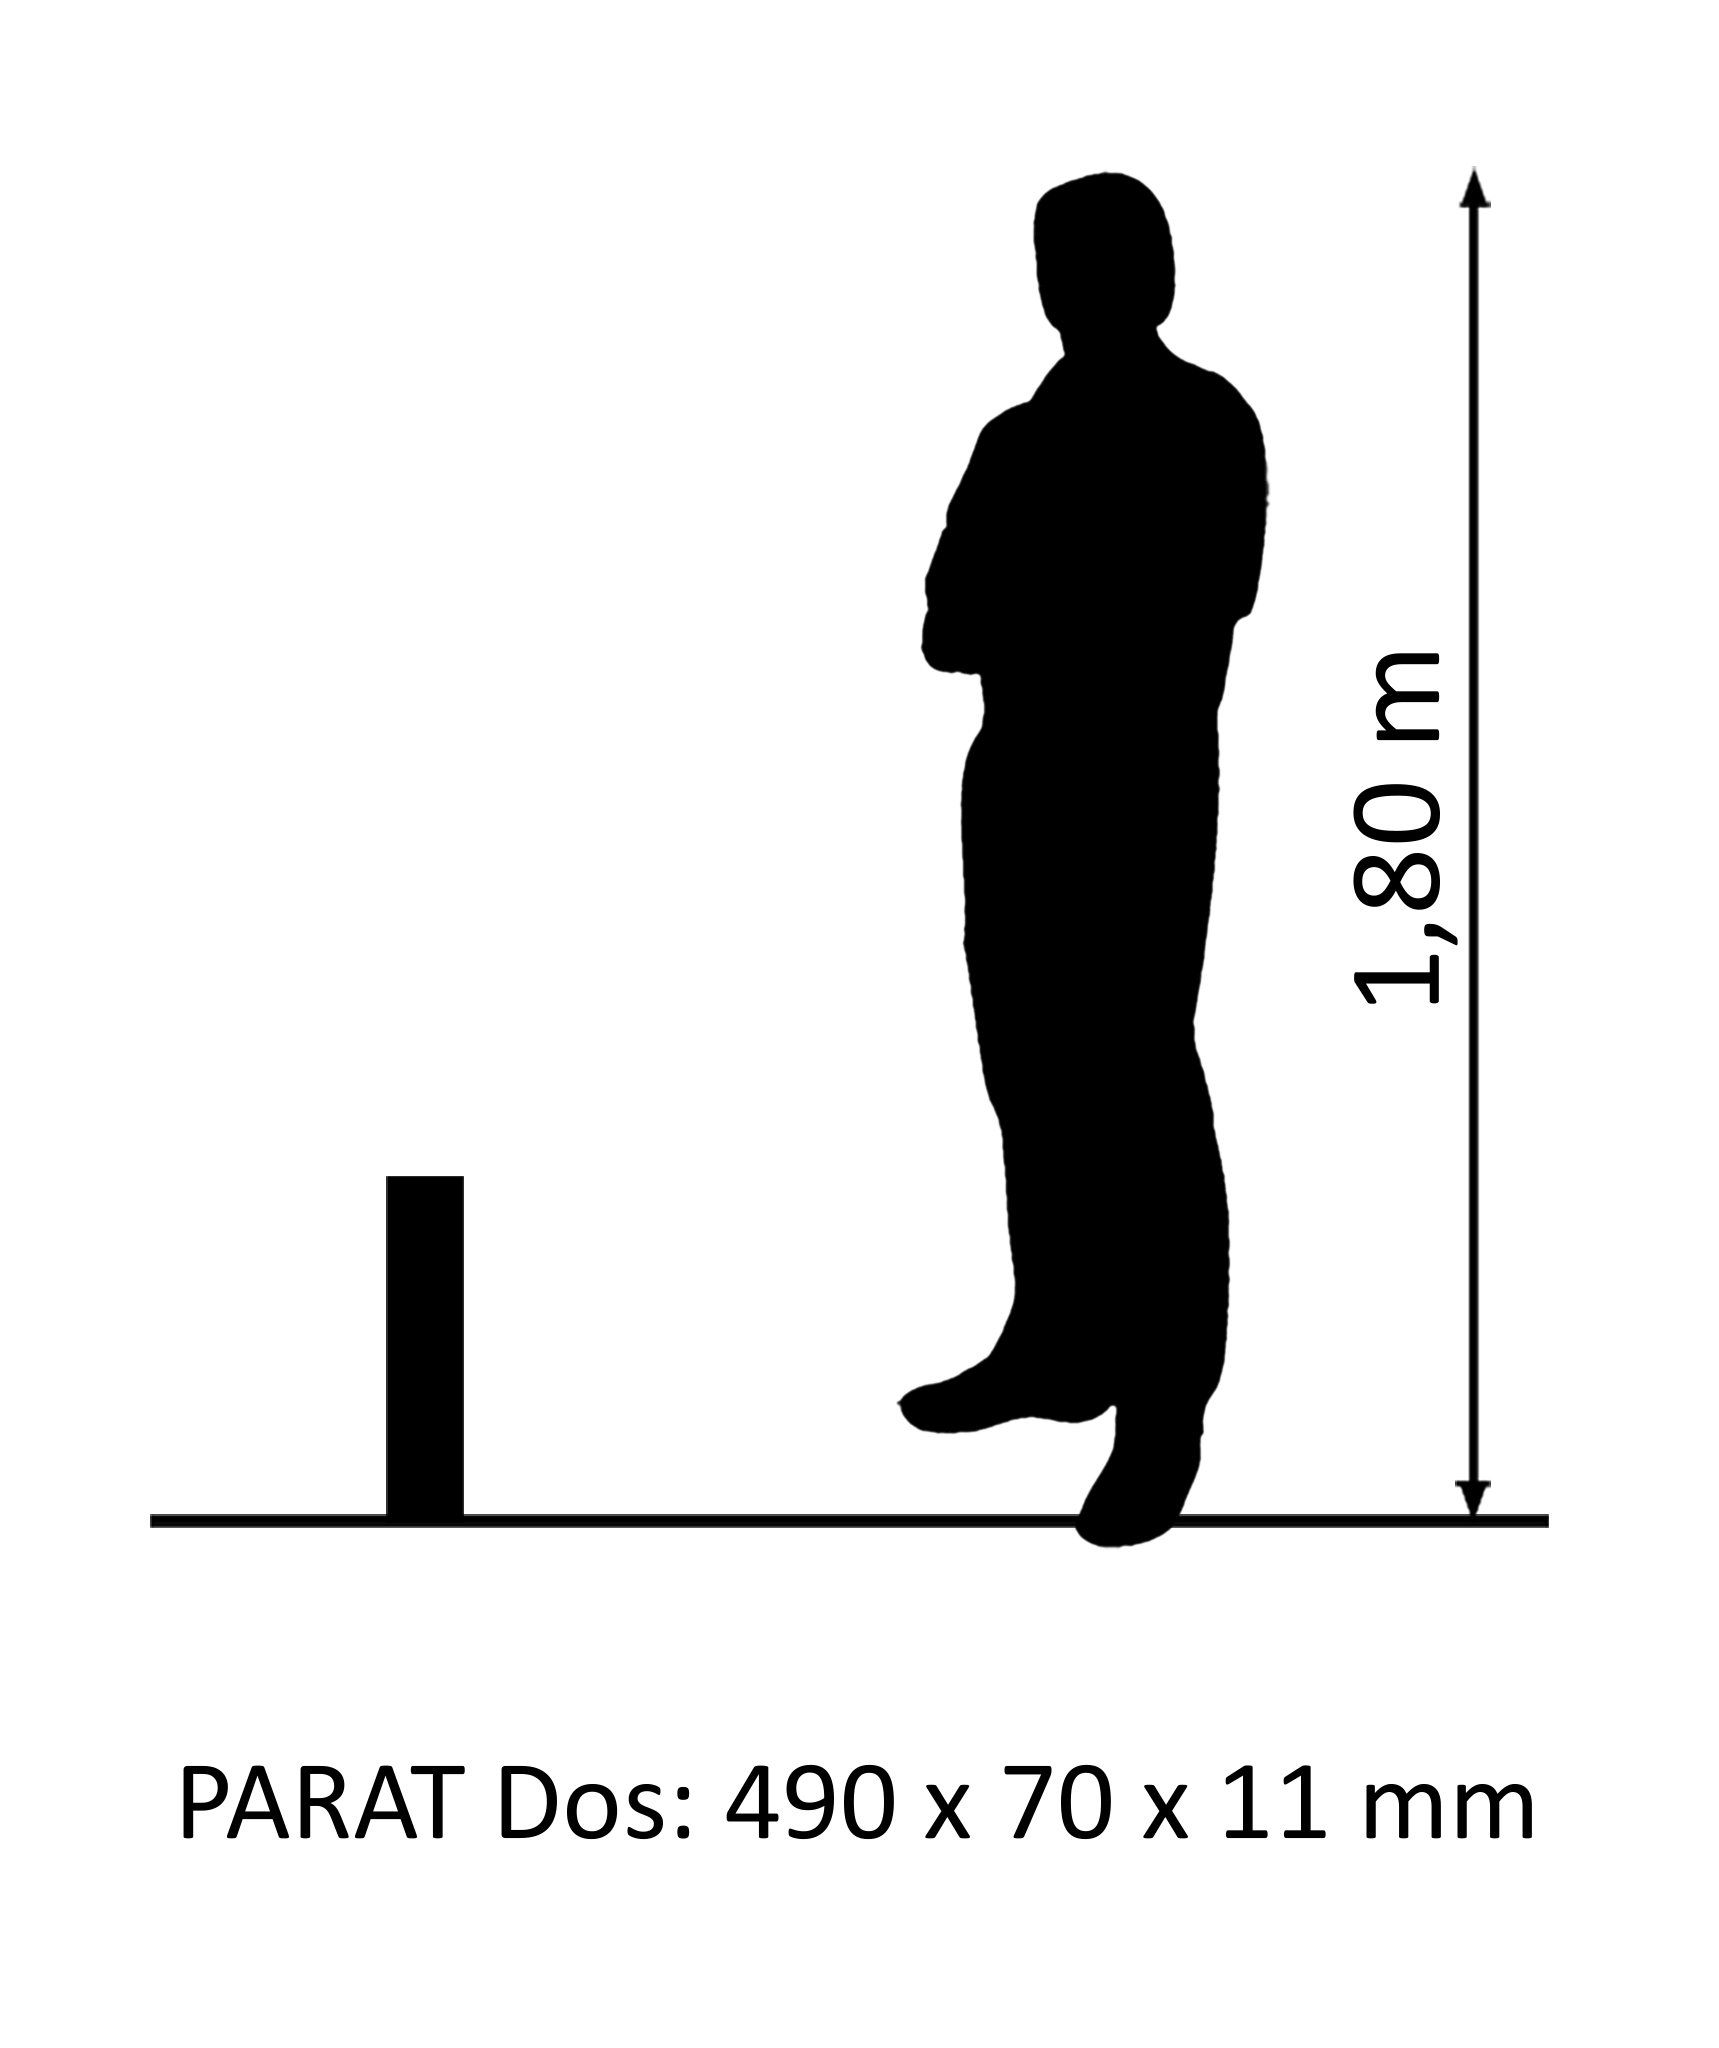 PARAT Dos Merbau Nature lacquer 11mm